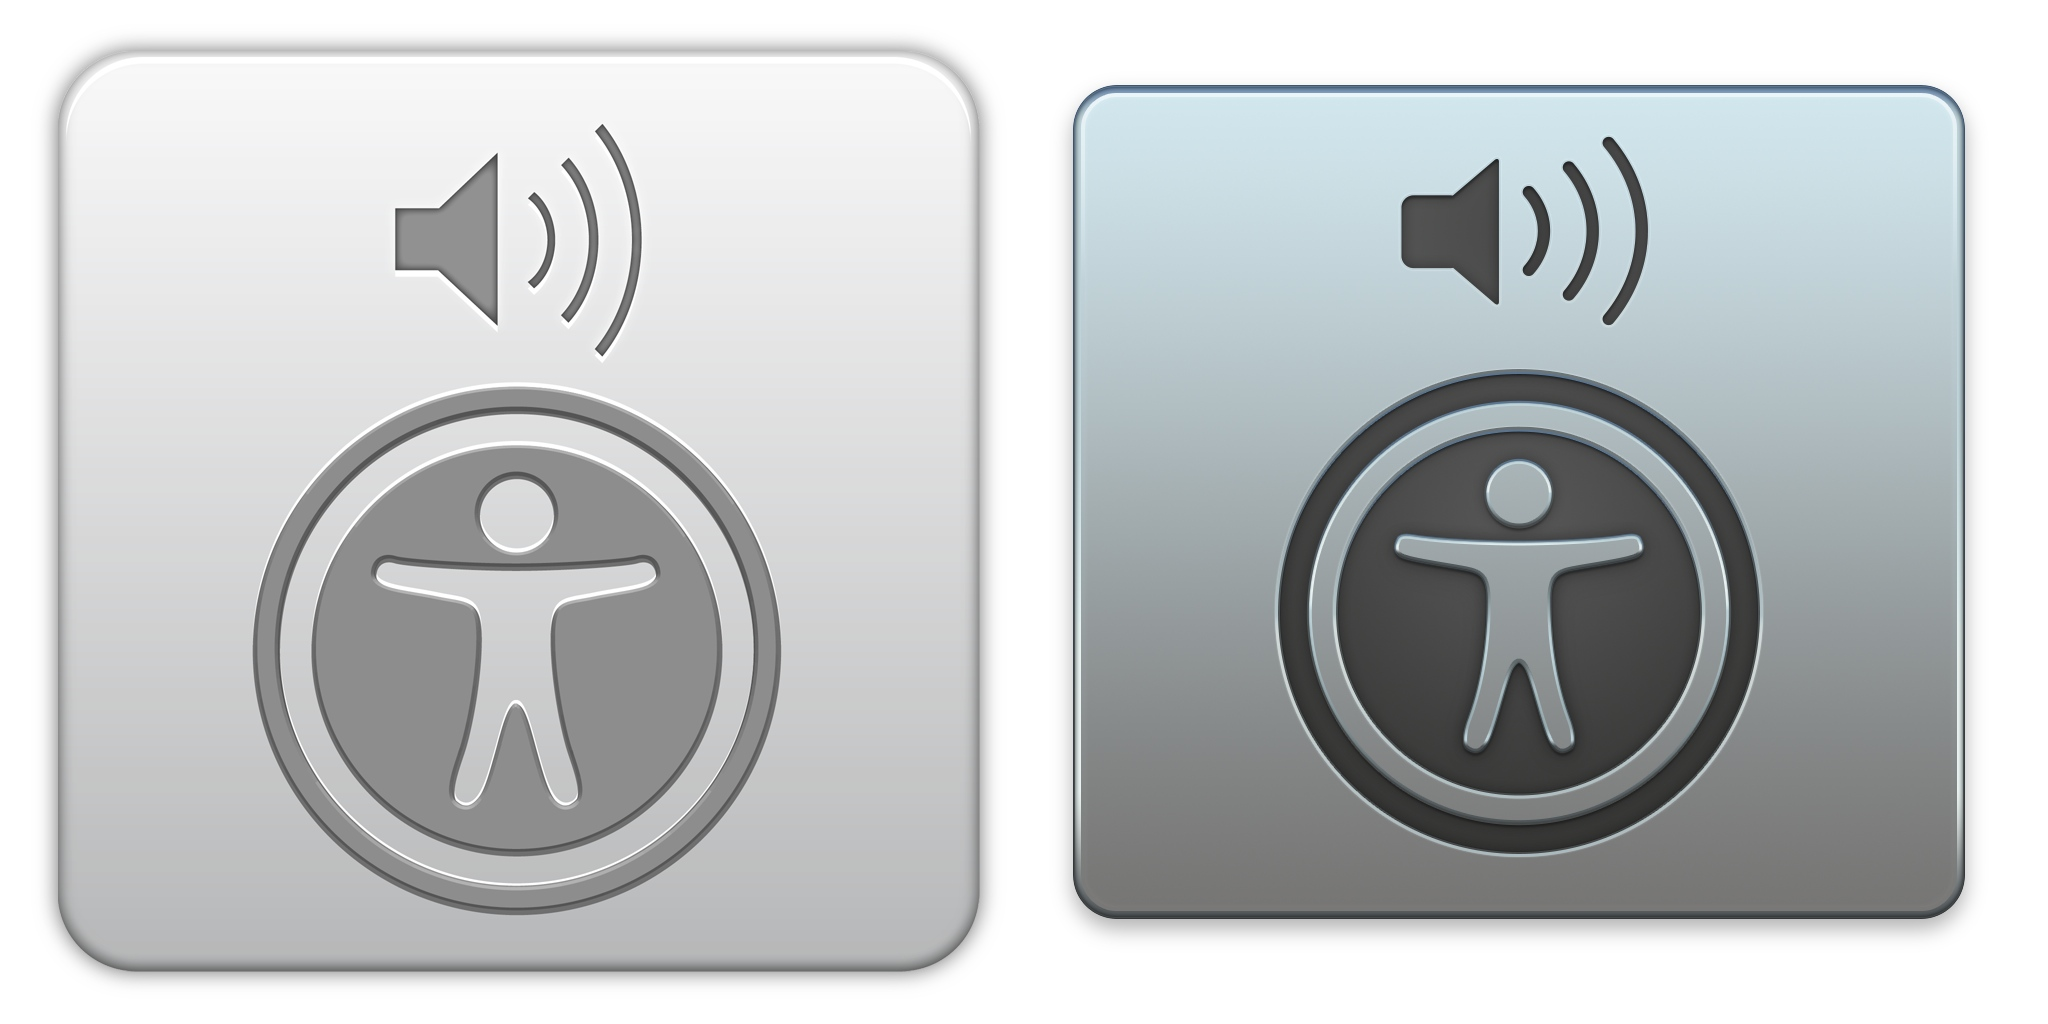 Utilidad VoiceOver